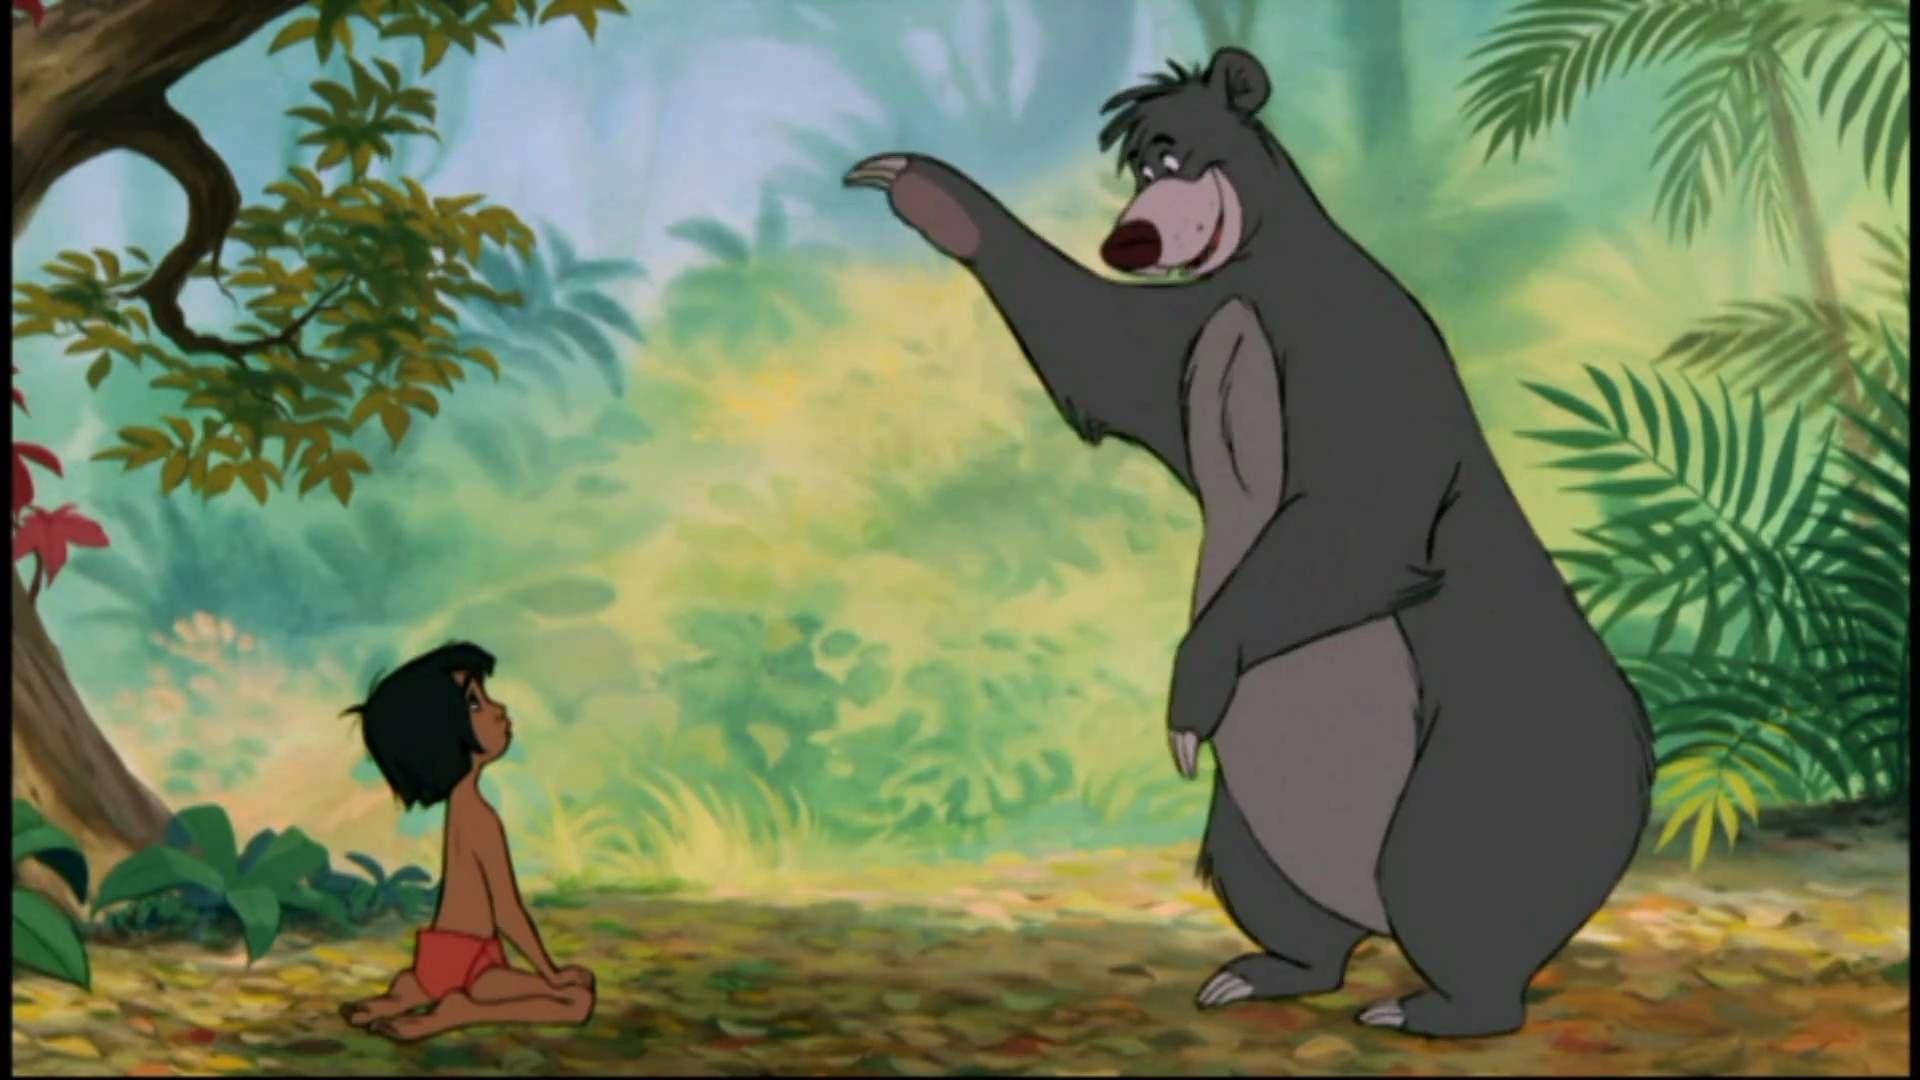 The Jungle Book Bare Necessities Eu Portuguese Disney Songs Disney Lyrics Disney Songs Playlist